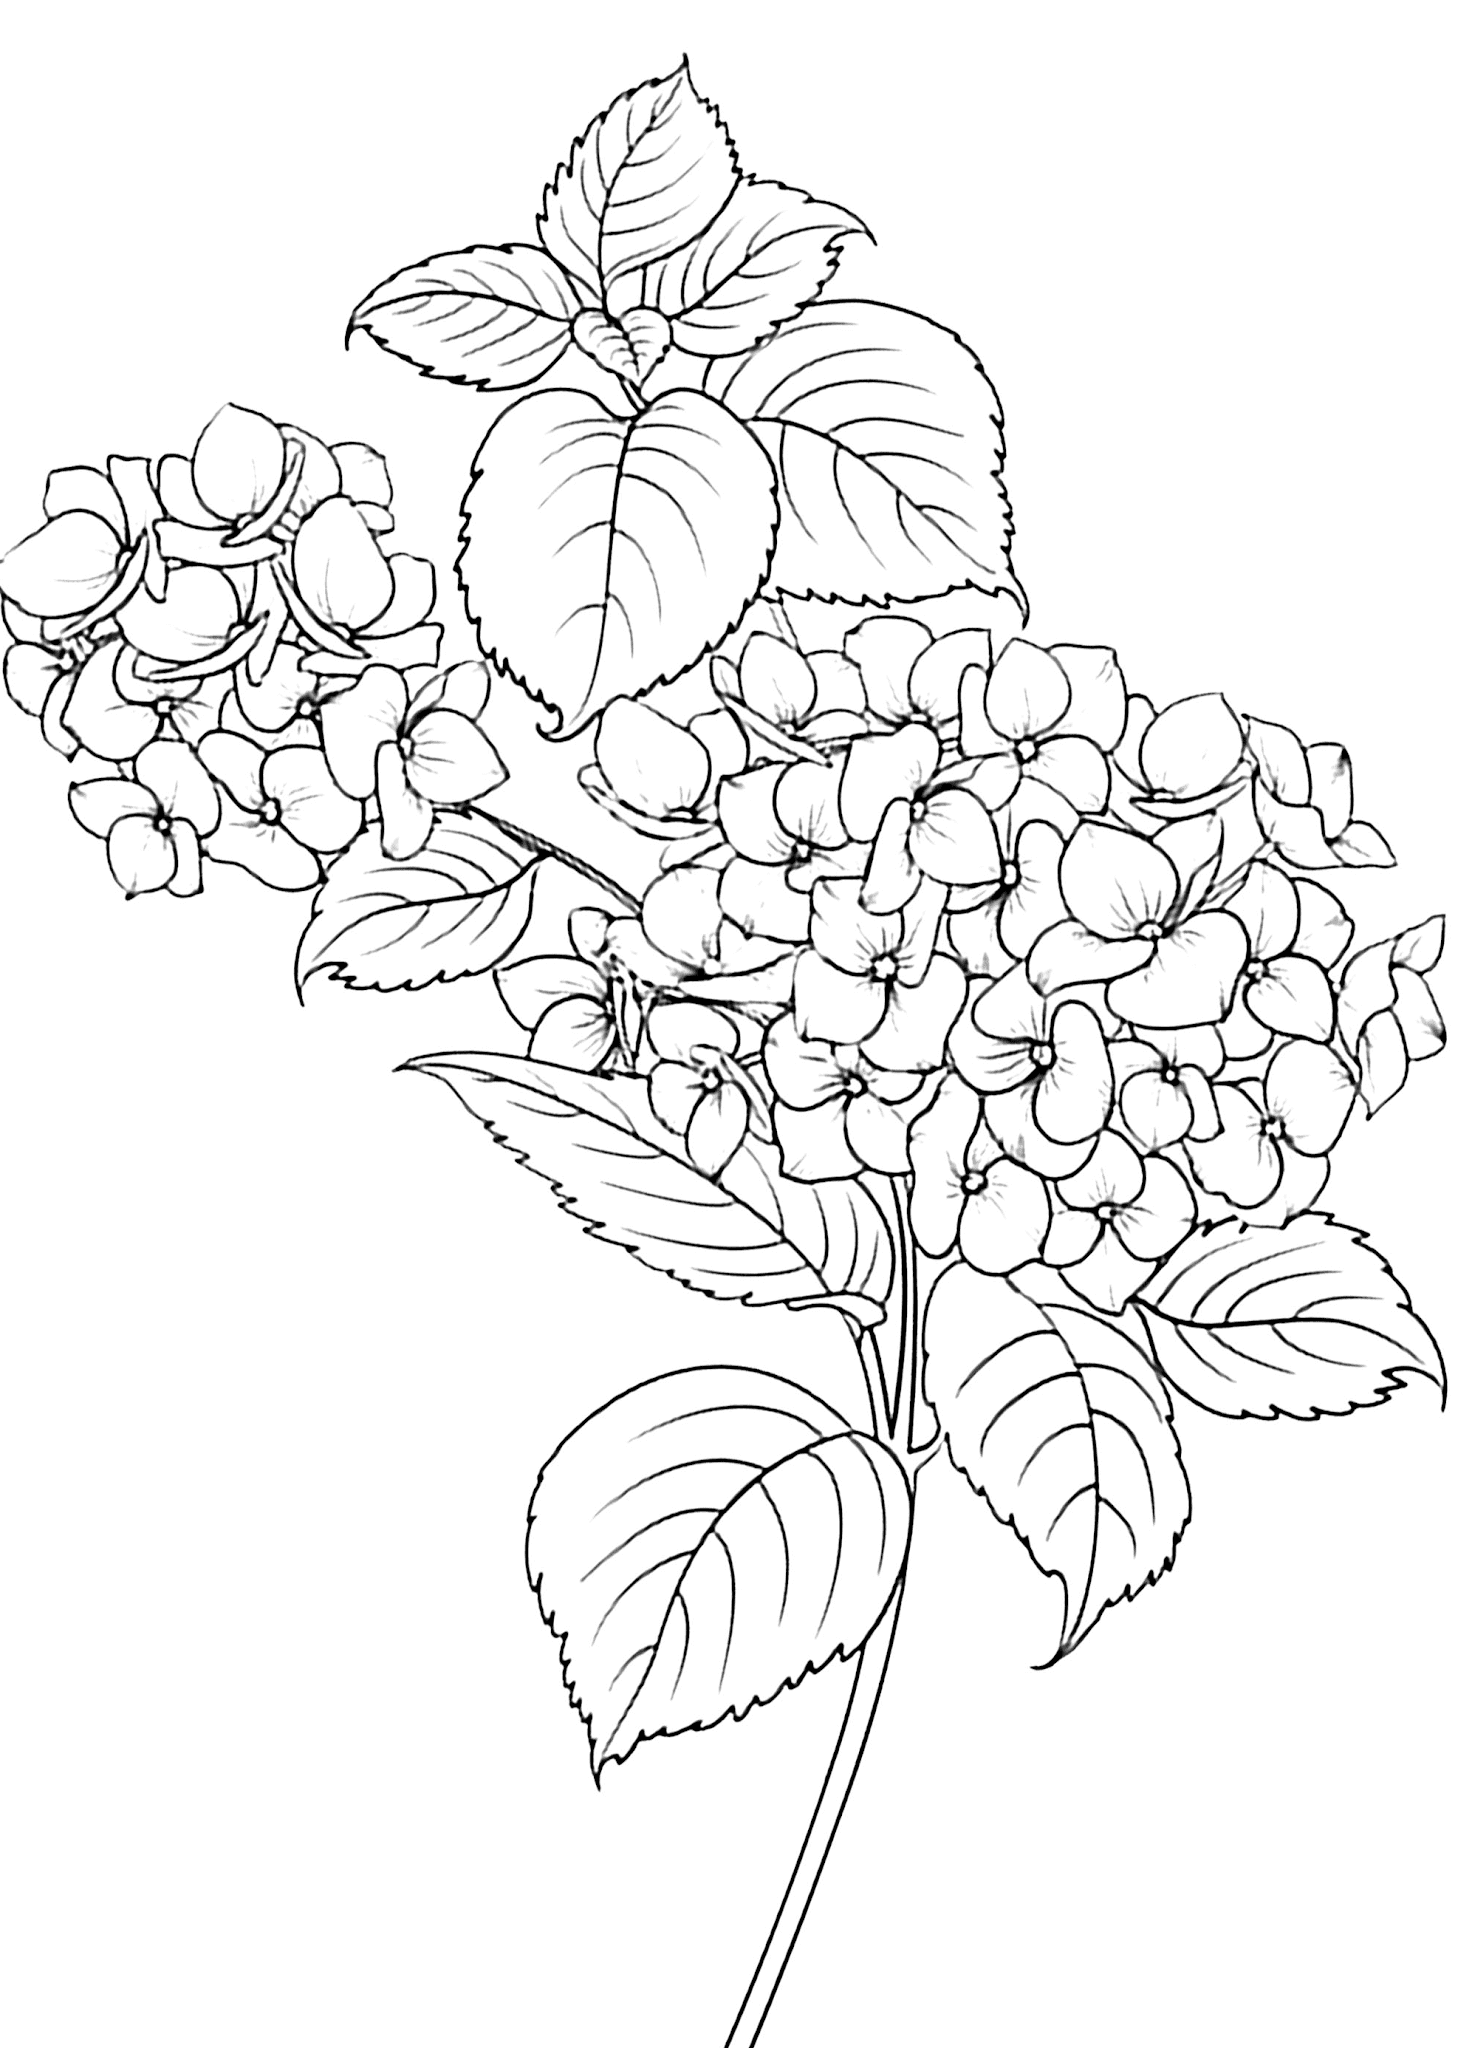 Gambar Mewarnai Bunga Untuk Anak PAUD dan TK